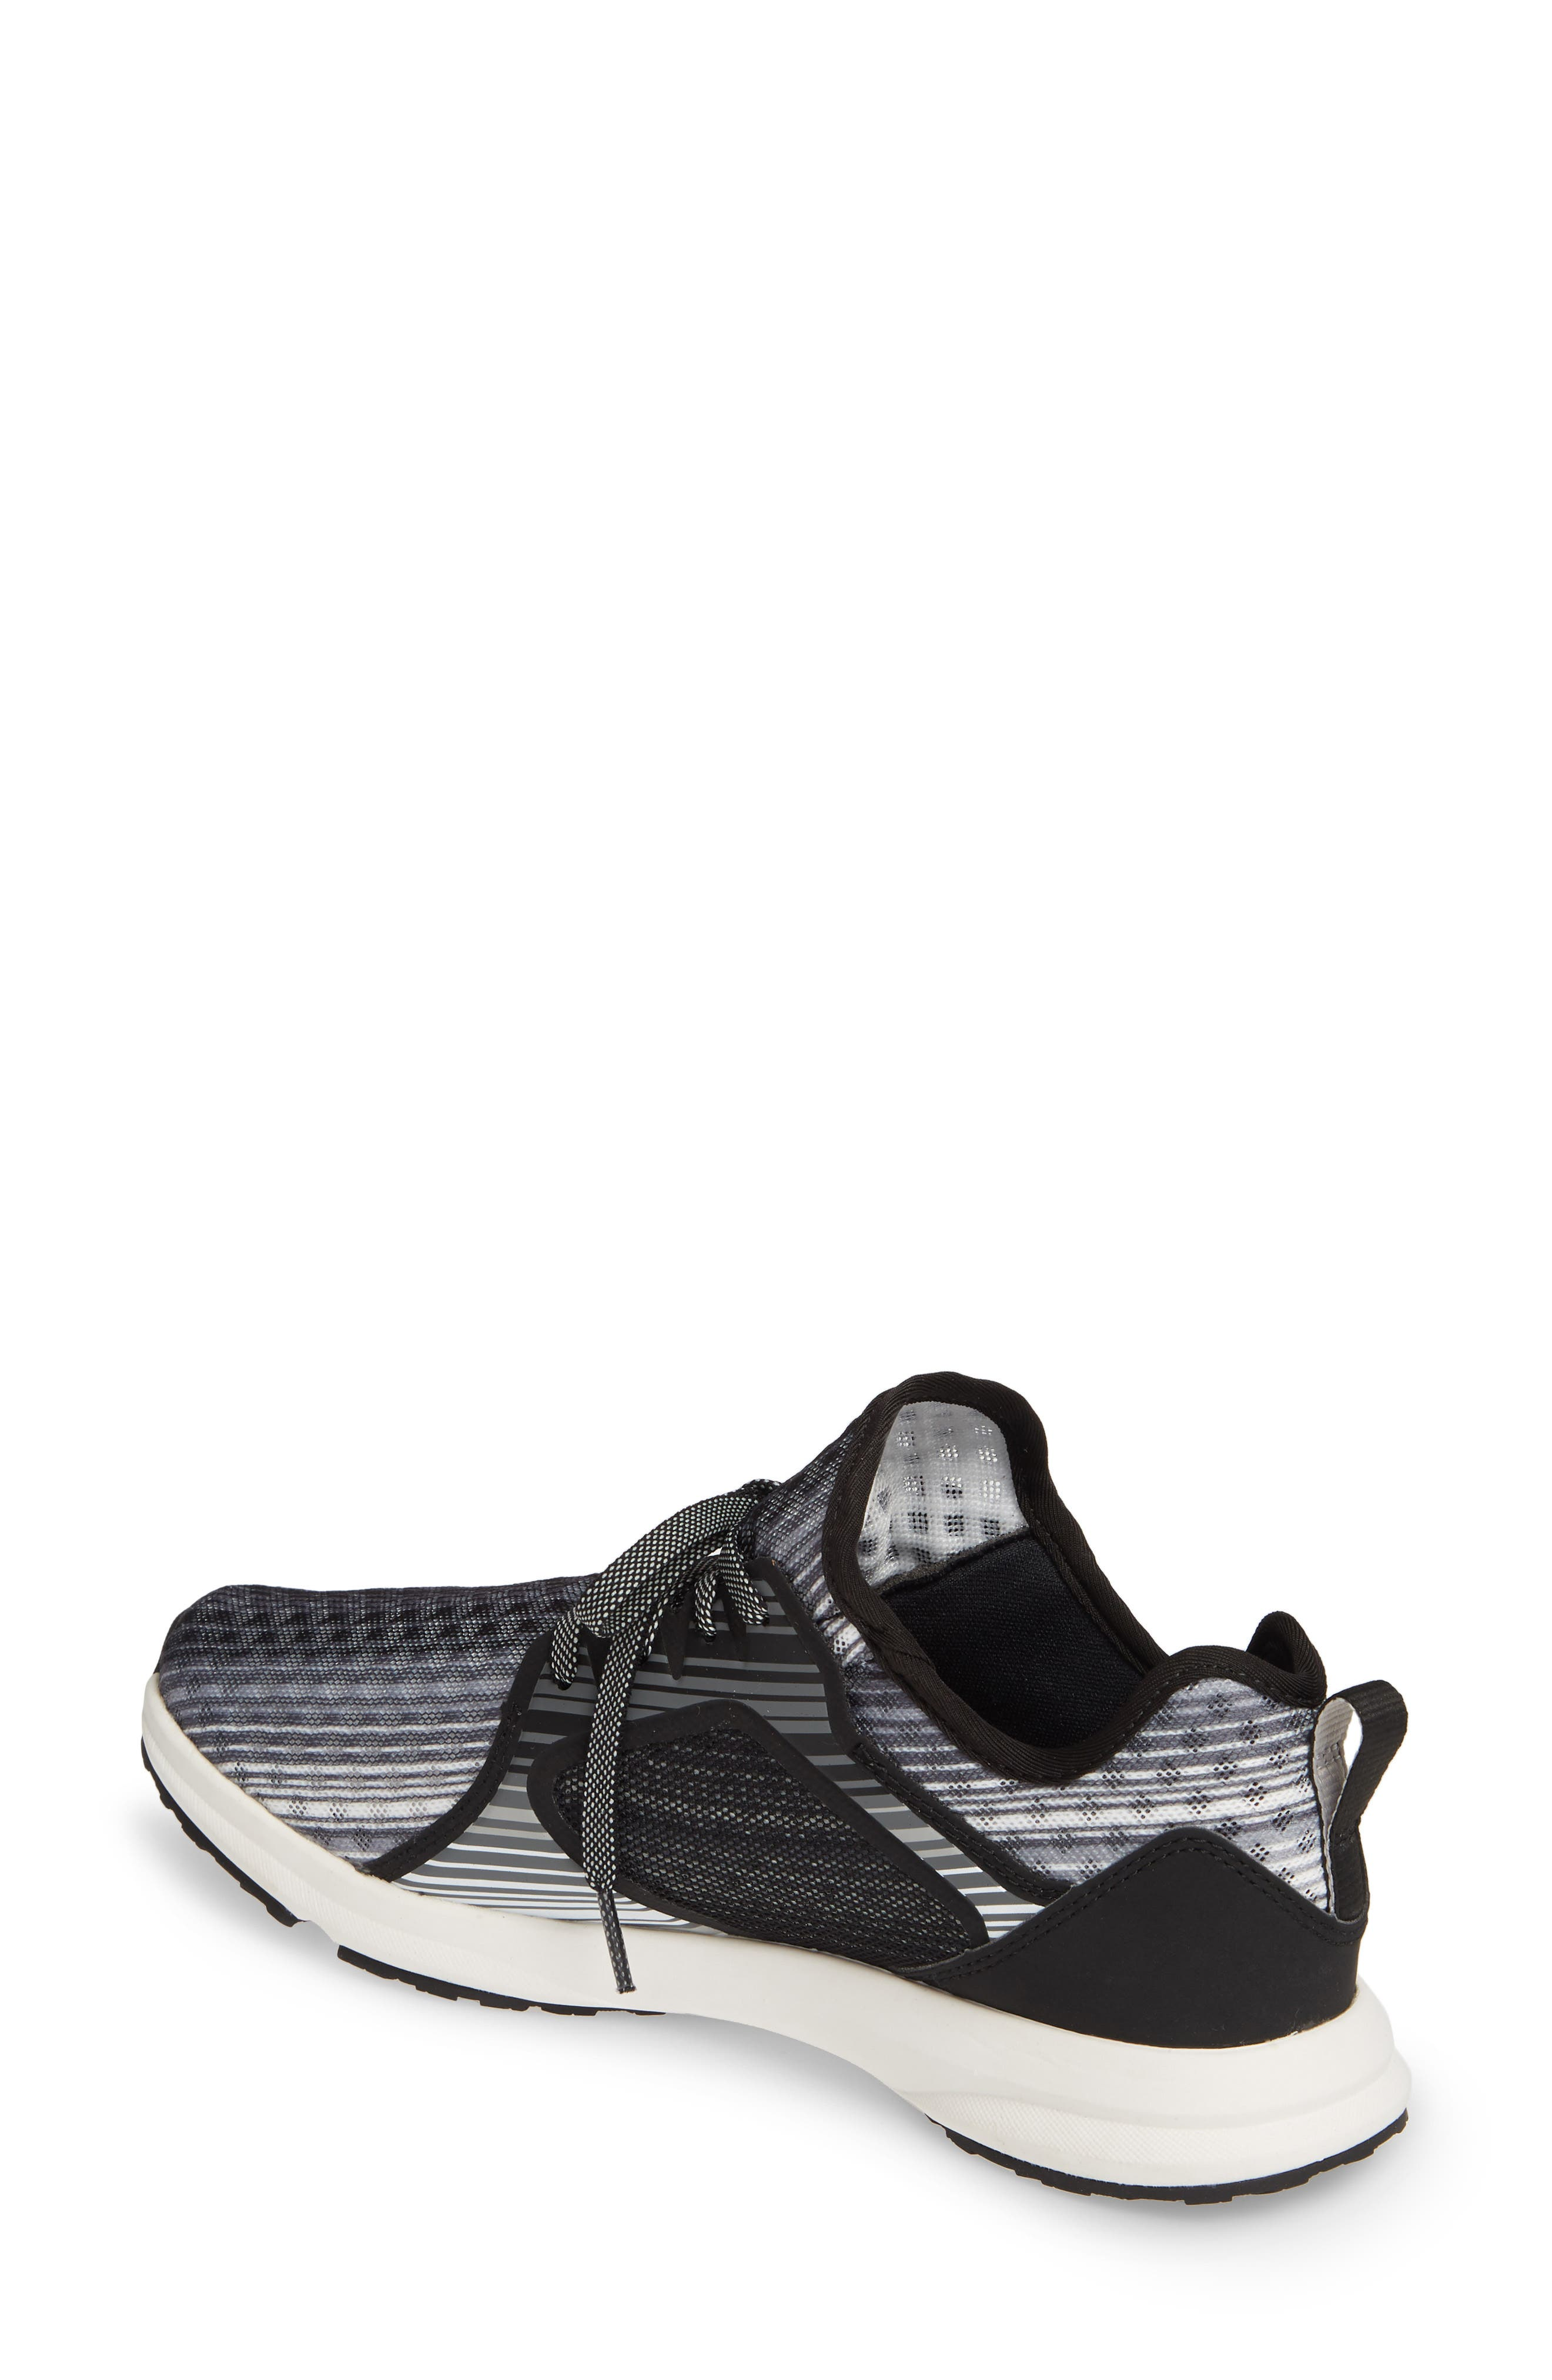 ARIAT, Fuse Print Sneaker, Alternate thumbnail 2, color, GREY STRIPE